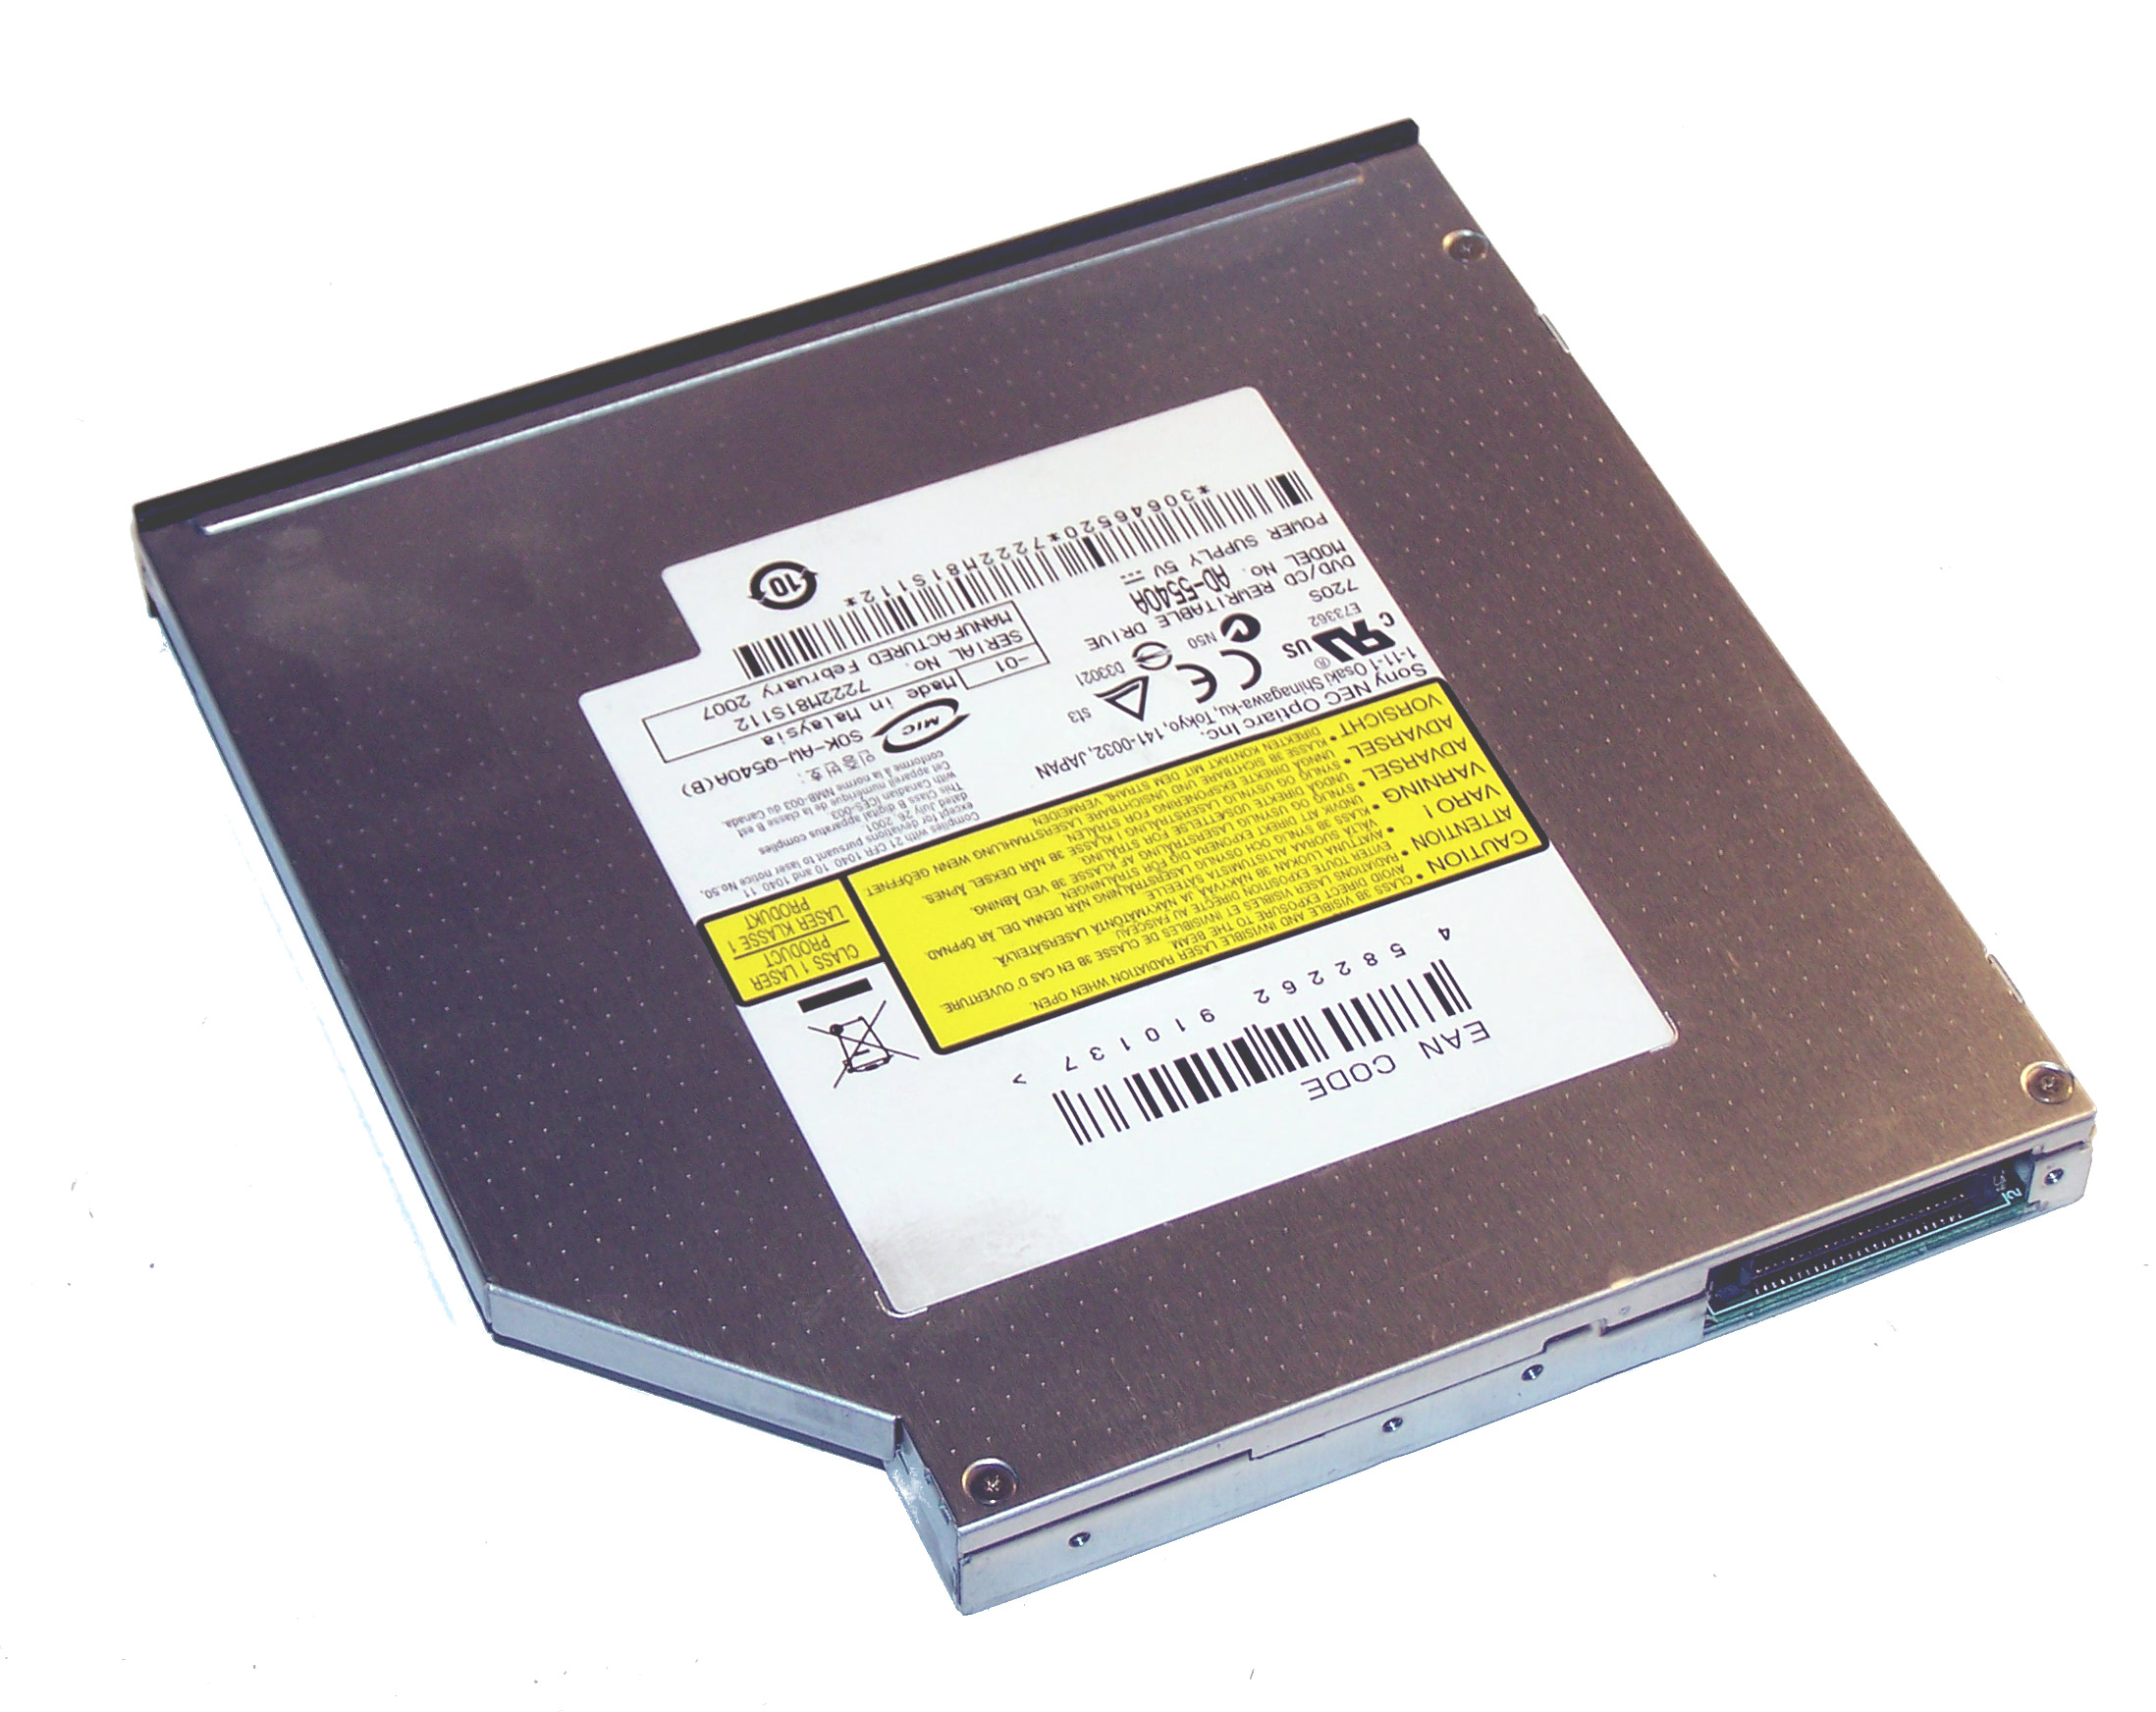 OPTIARC DVD RW AD 5540A ATA DEVICE DRIVER